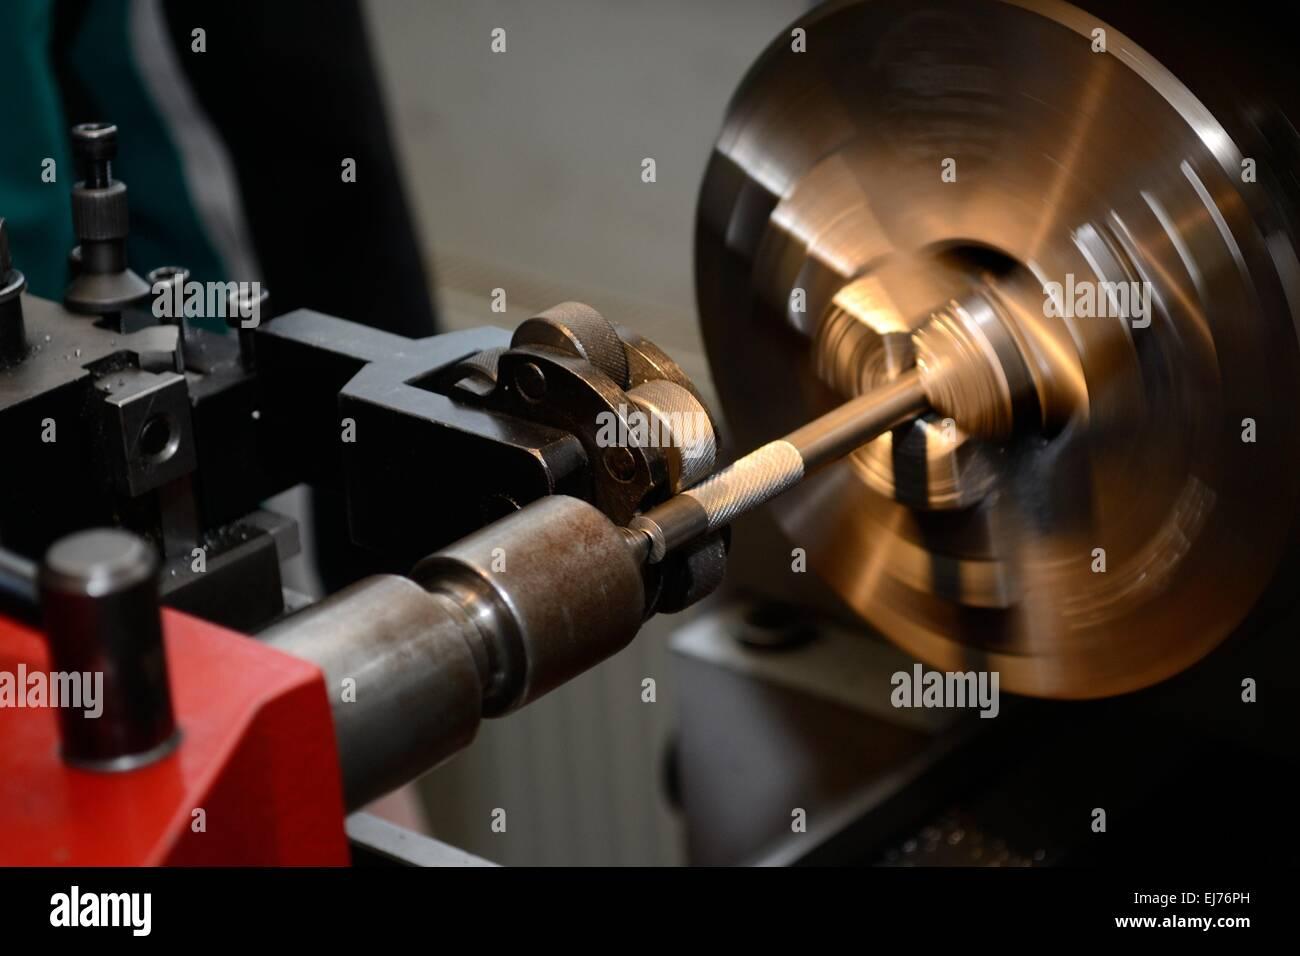 metal working lathe Stock Photo